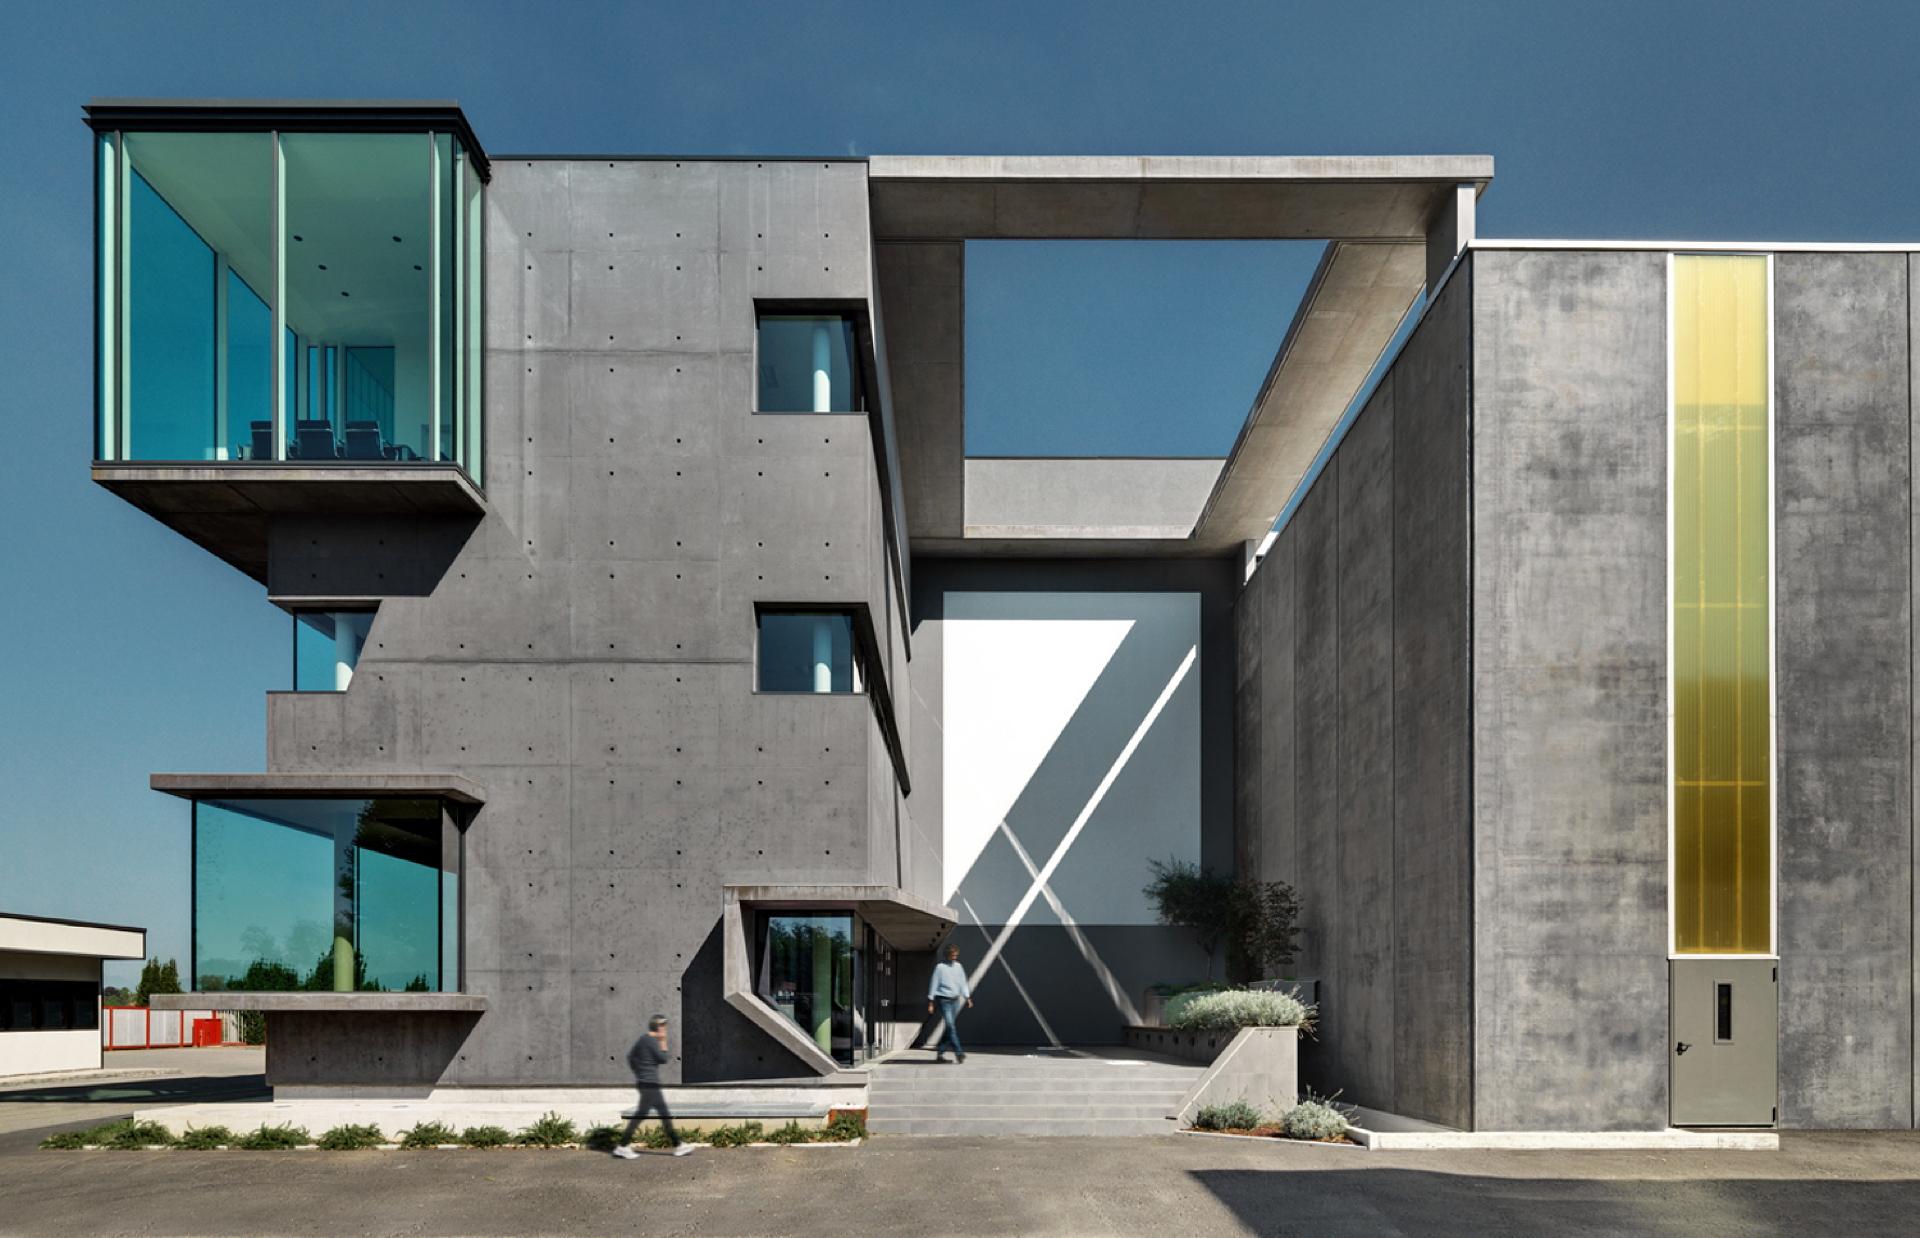 Studio DC10: Nuovi uffici nell'ex magazzino SICAD a Uboldo, Varese